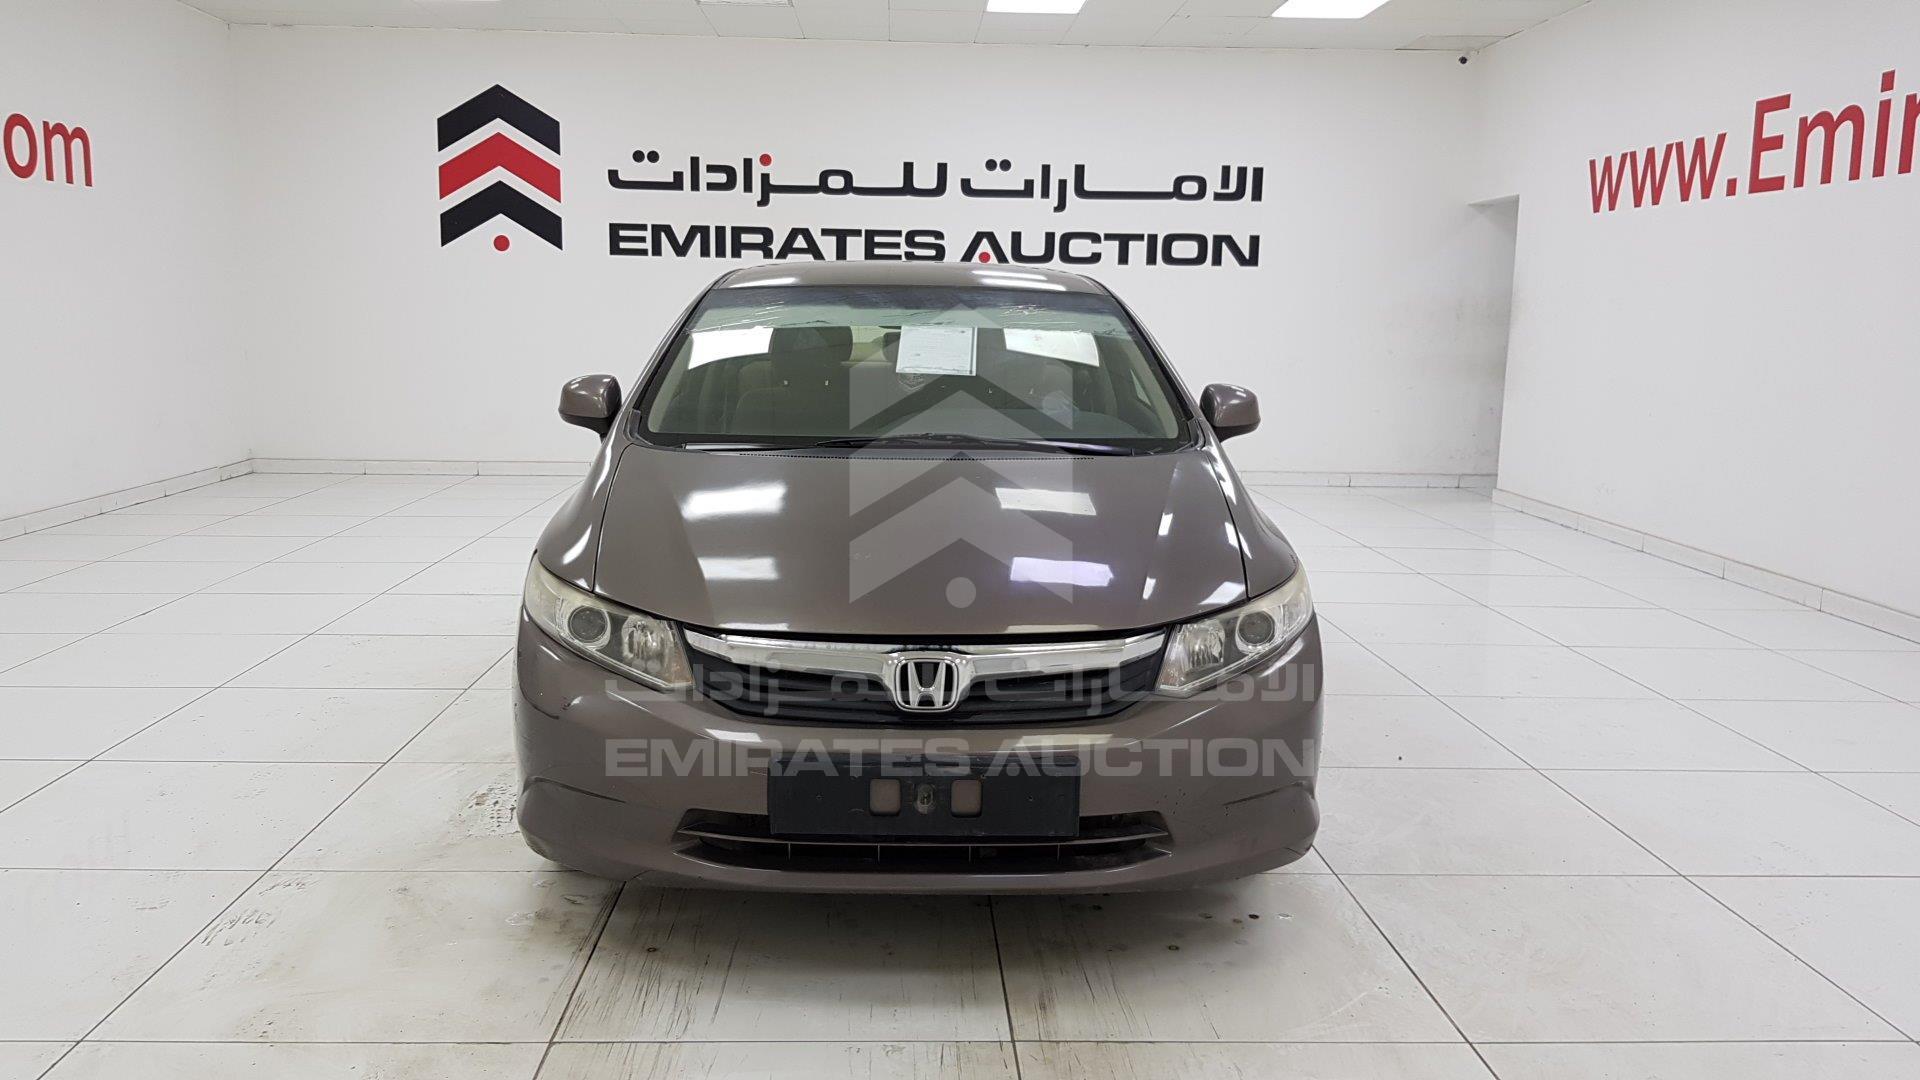 2012 Honda Civic For Sale In Uae 117153